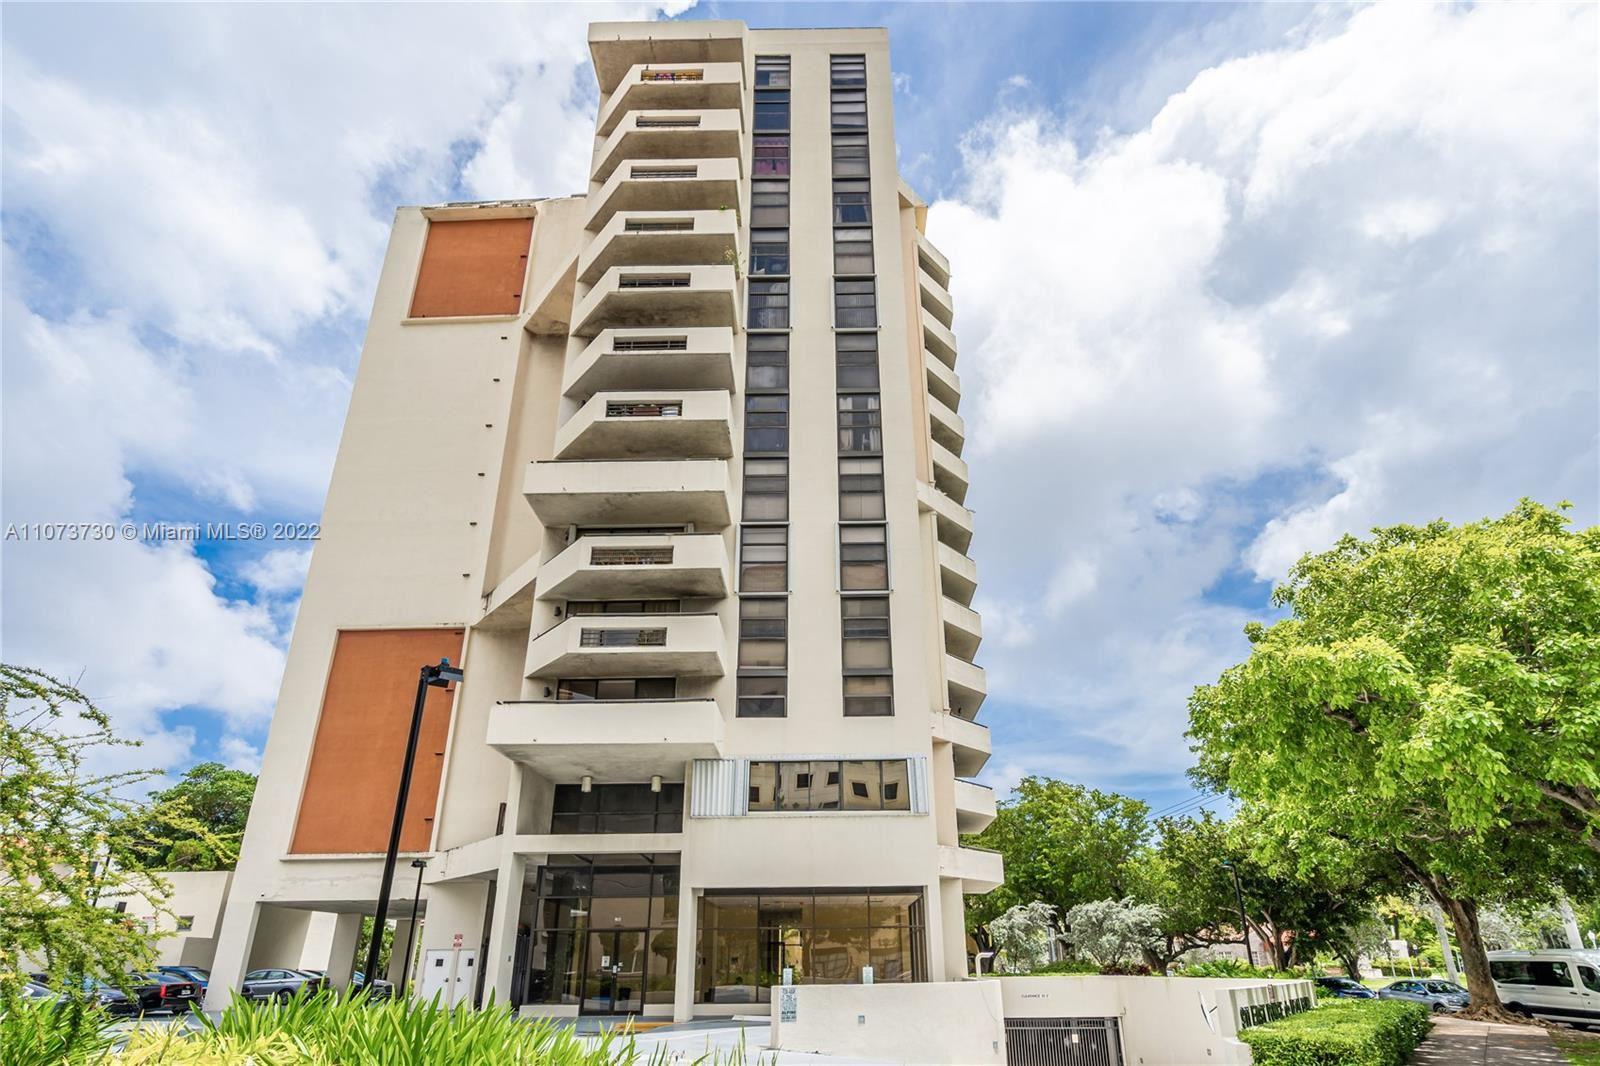 911 E Ponce De Leon Blvd #PH1602, Coral Gables, FL 33134 - #: A11073730